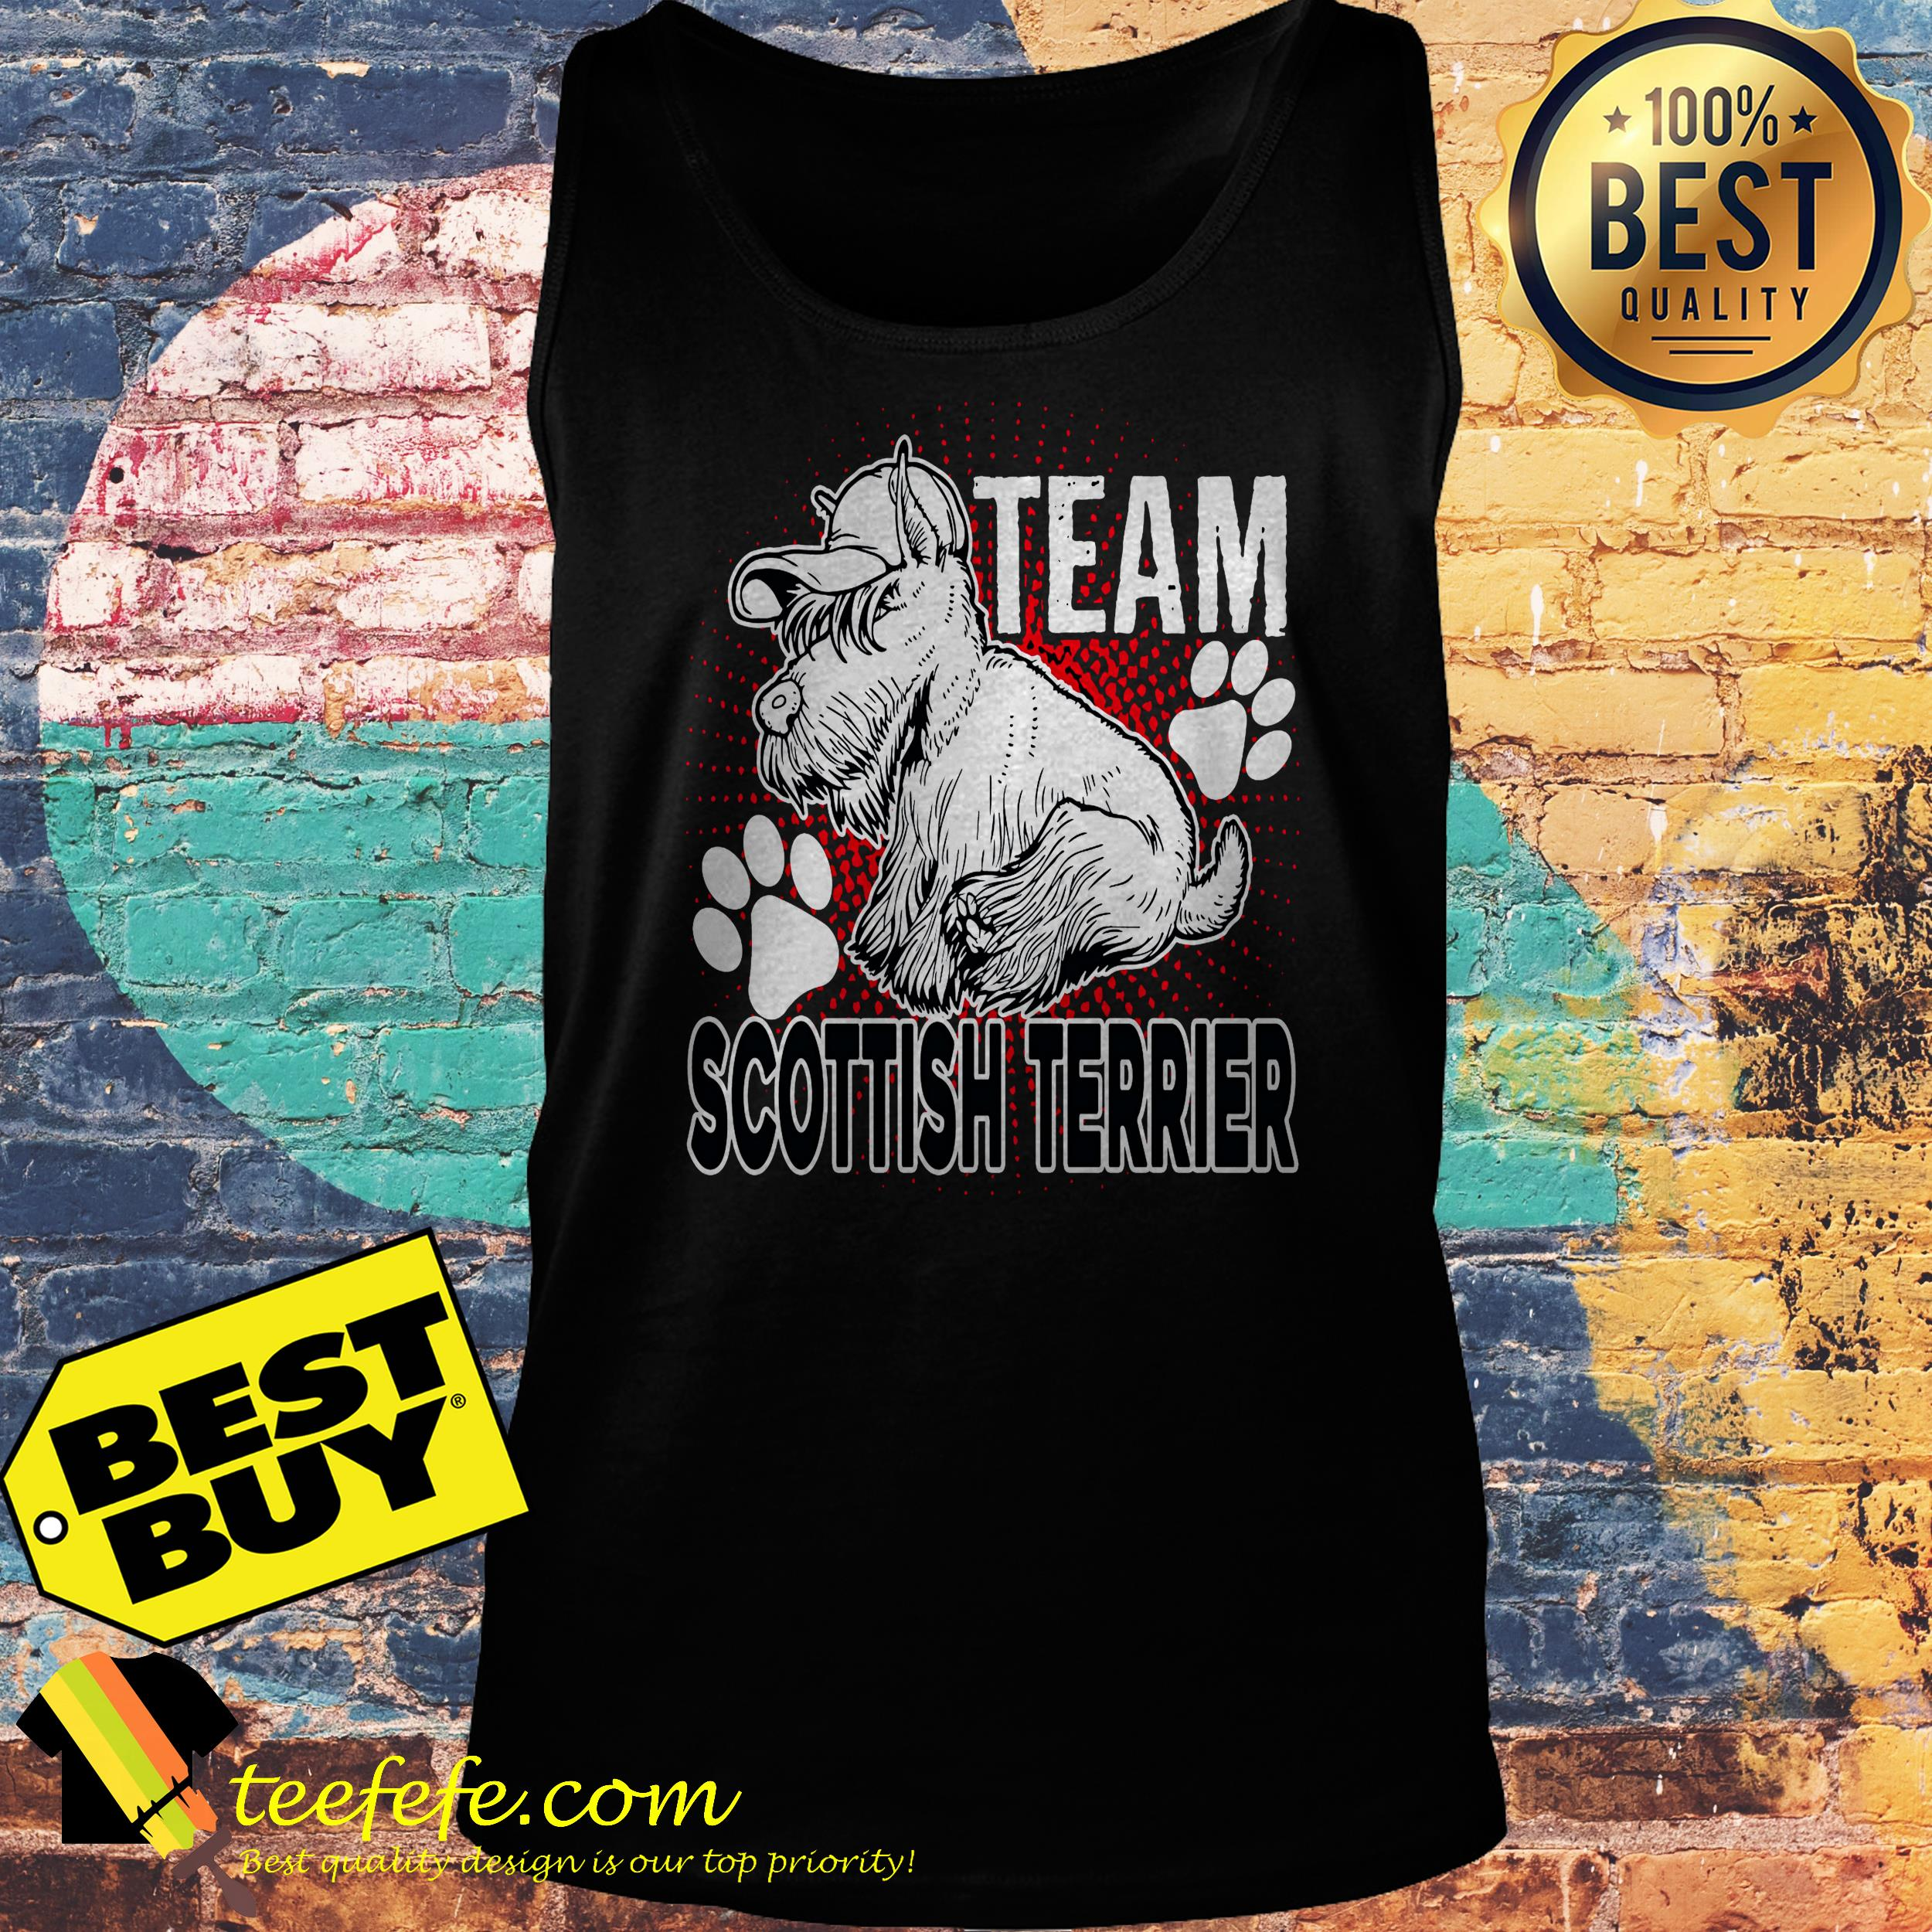 Team Scottish Terrier tank top